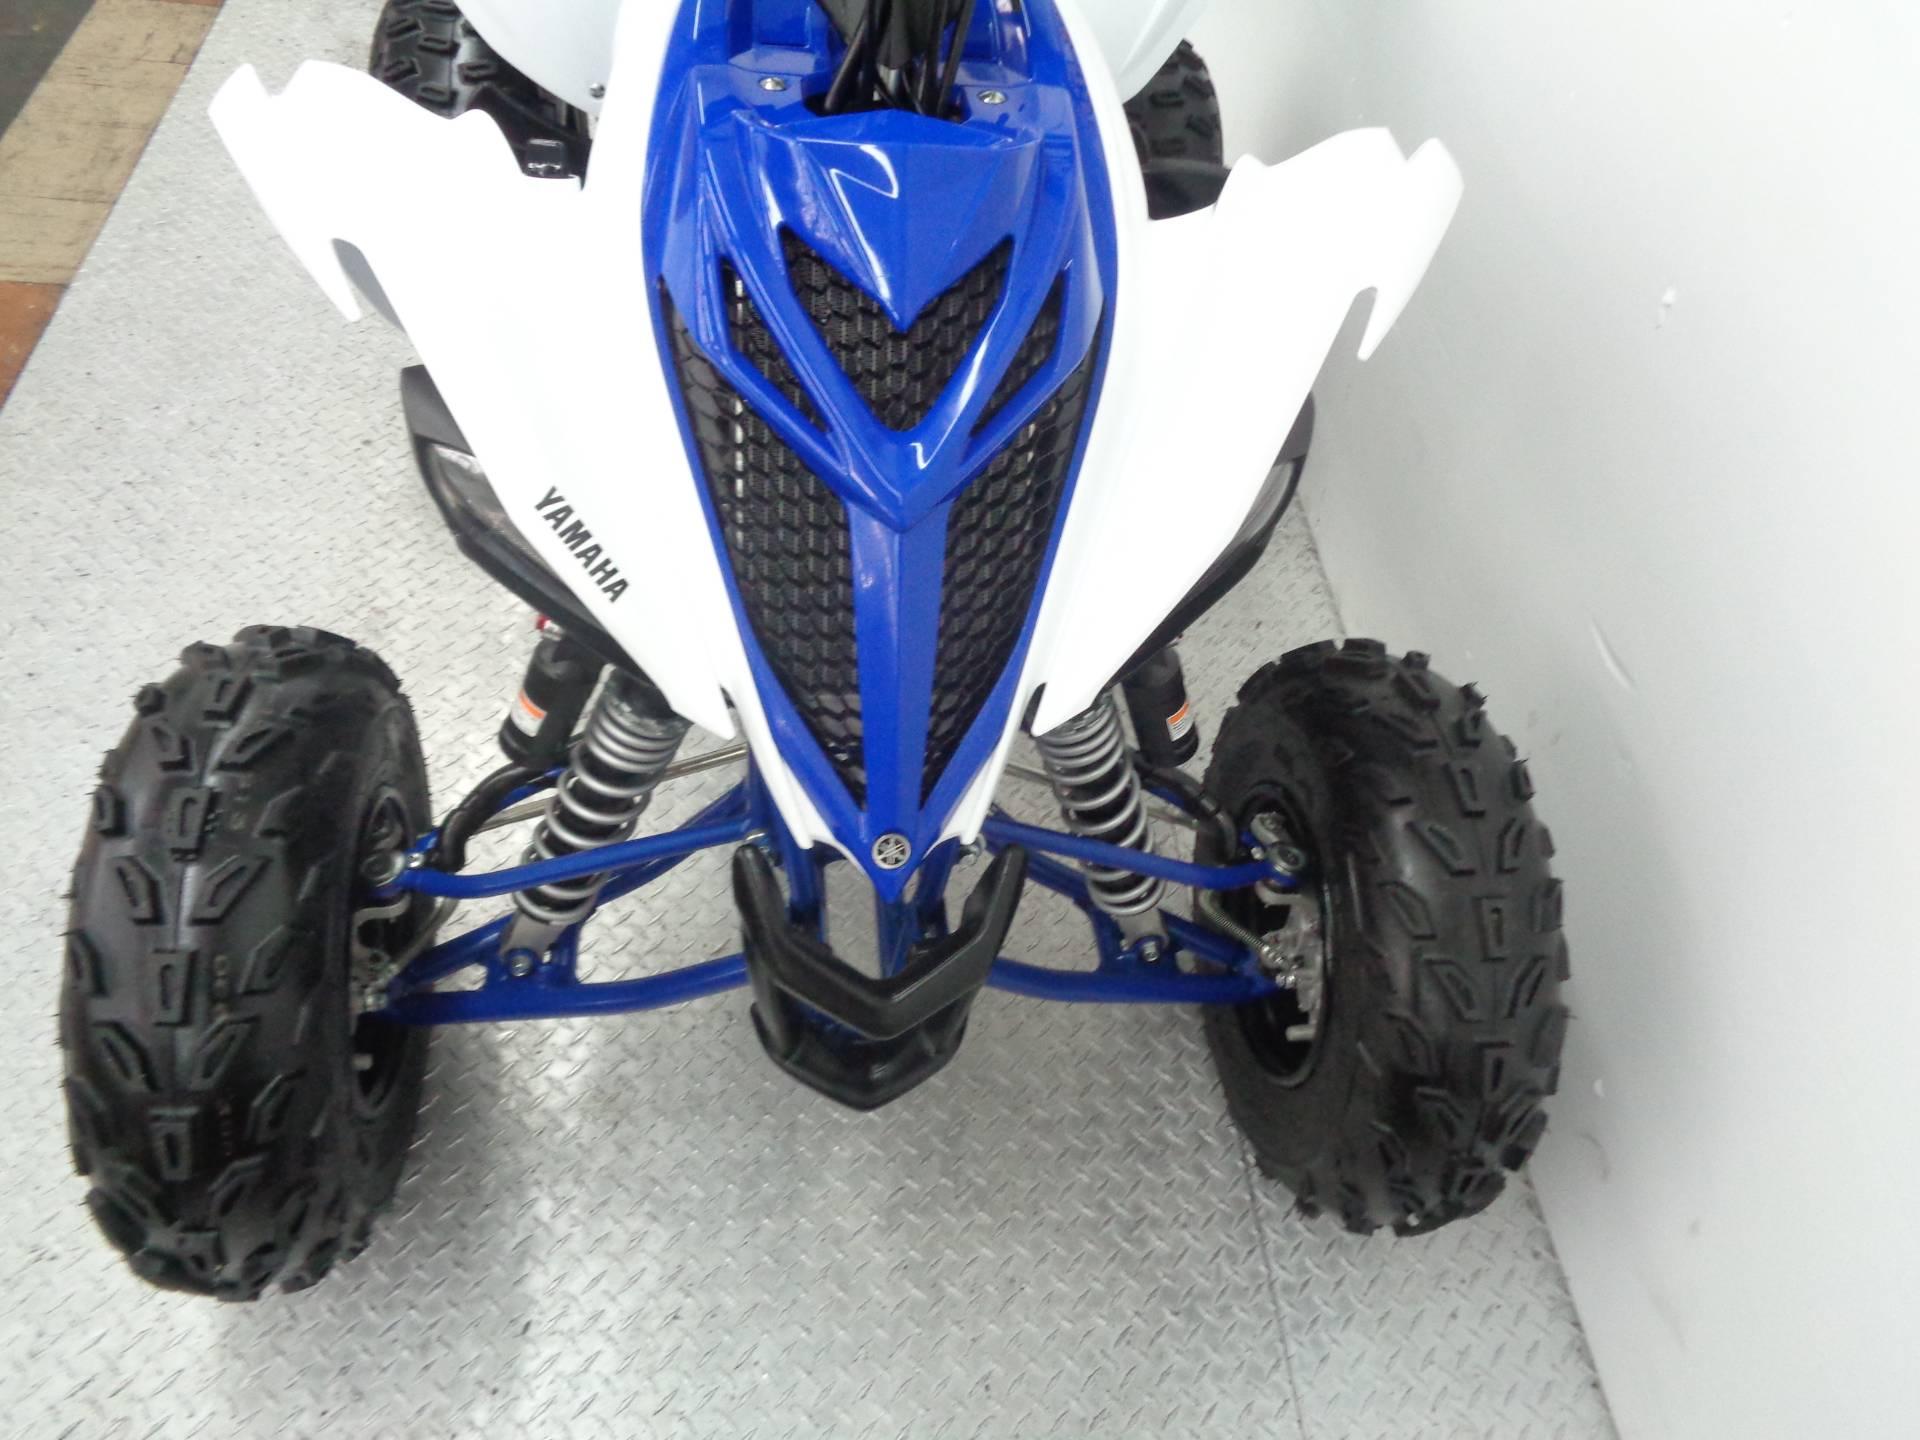 2017 Yamaha Raptor 700R 3